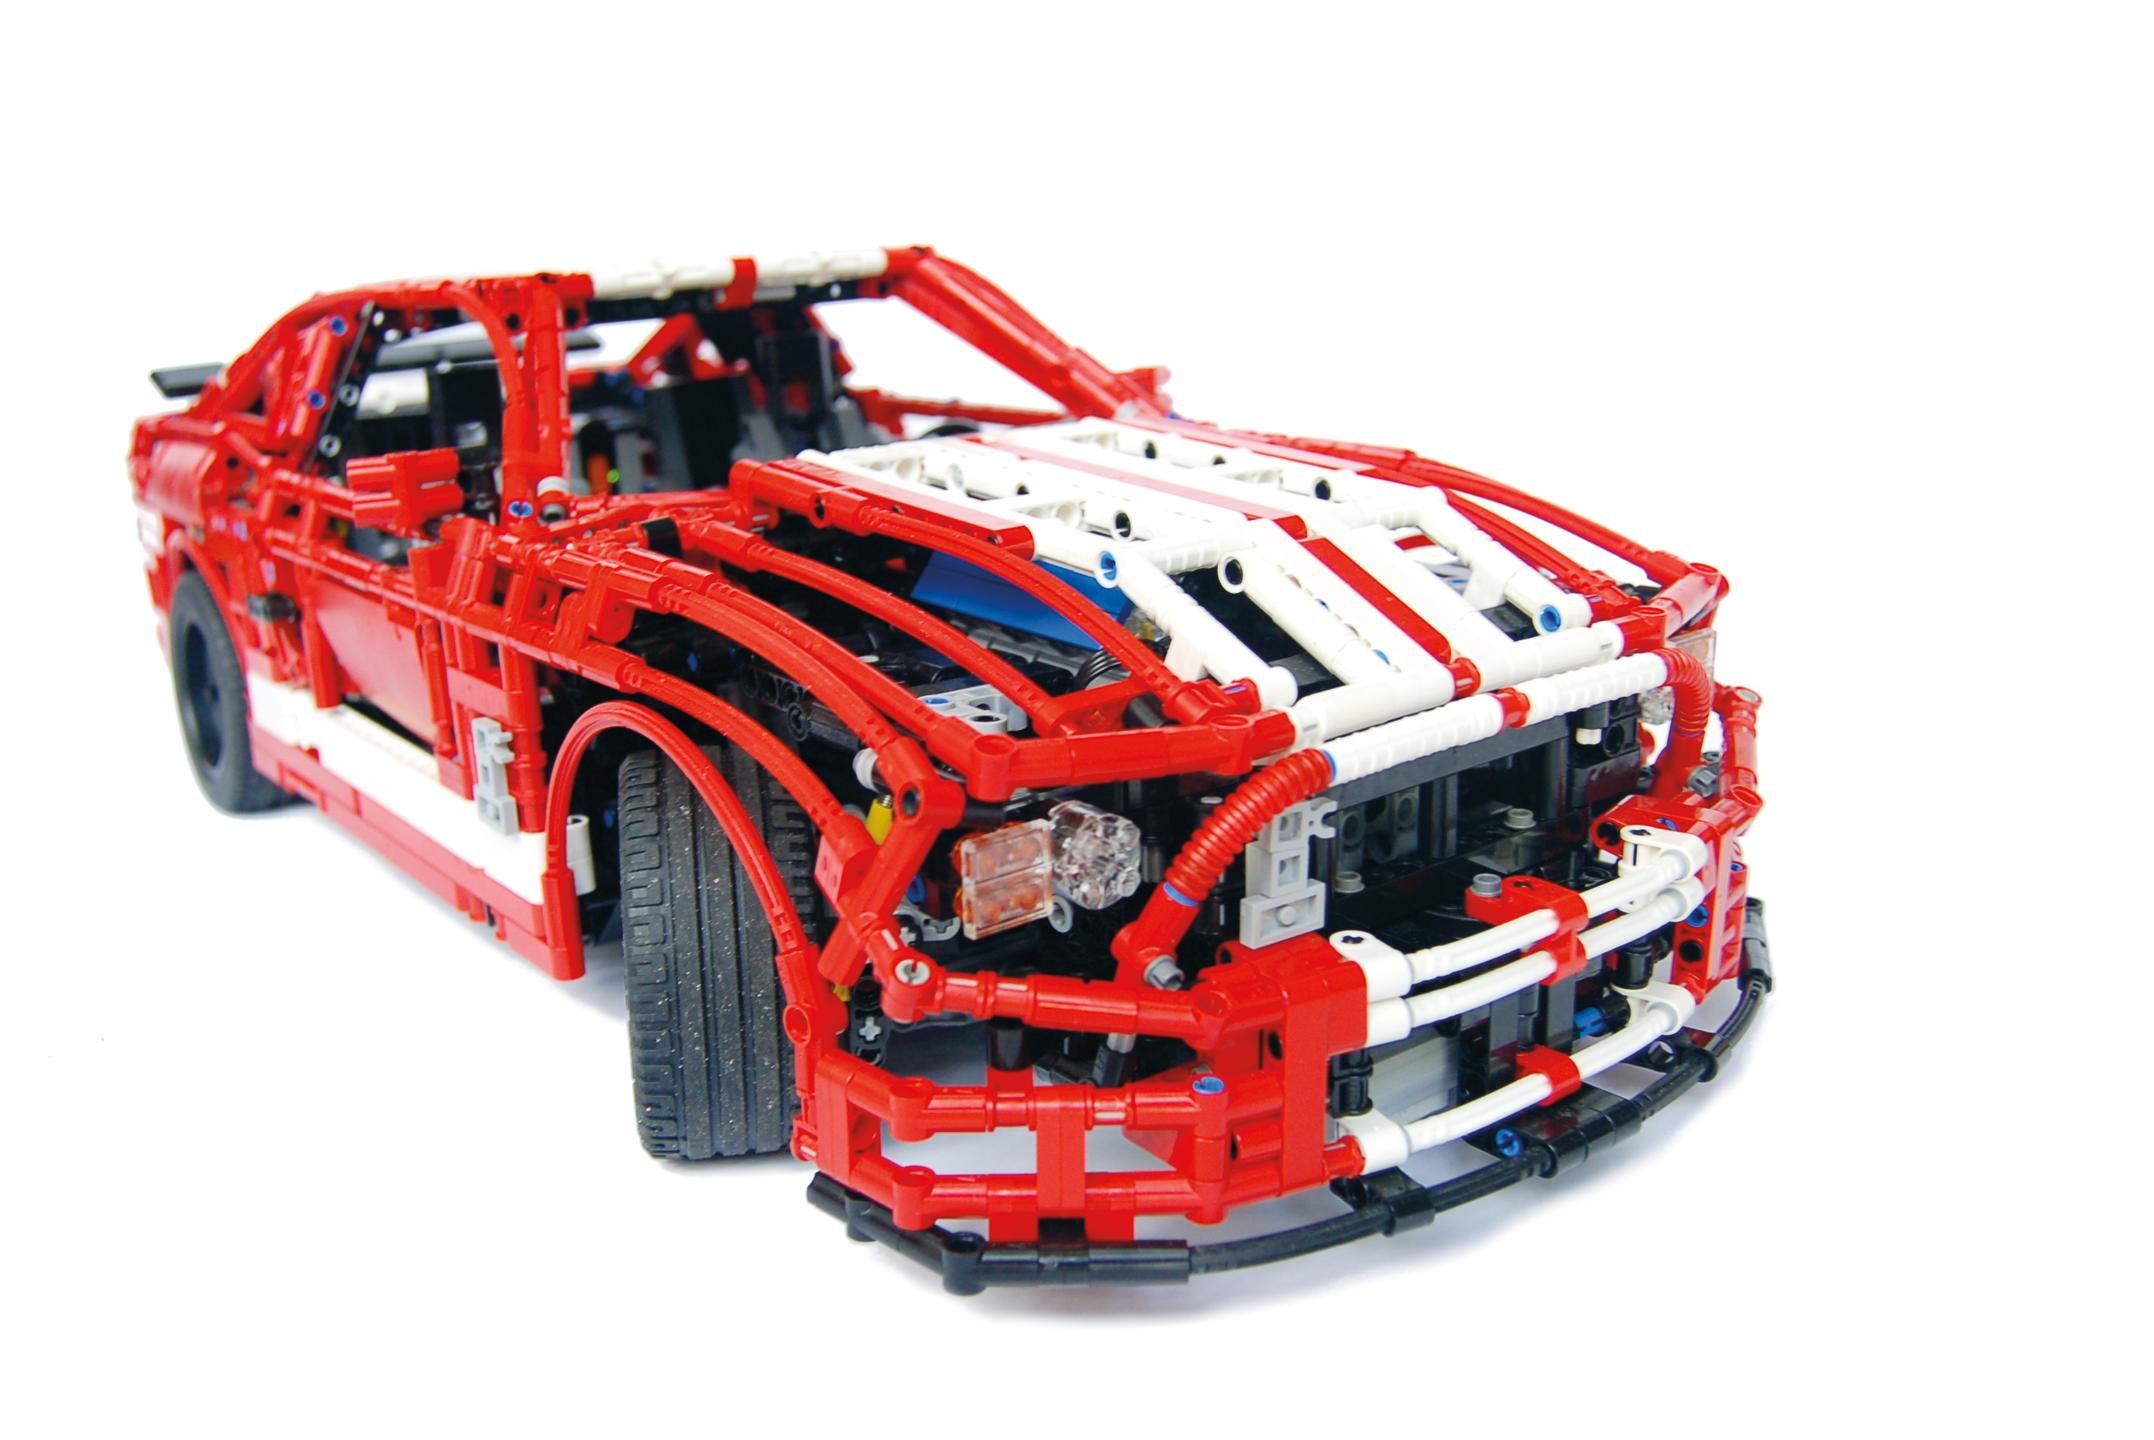 incredible lego technic cars trucks robots more pawel sariel kmiec 9781593275877. Black Bedroom Furniture Sets. Home Design Ideas